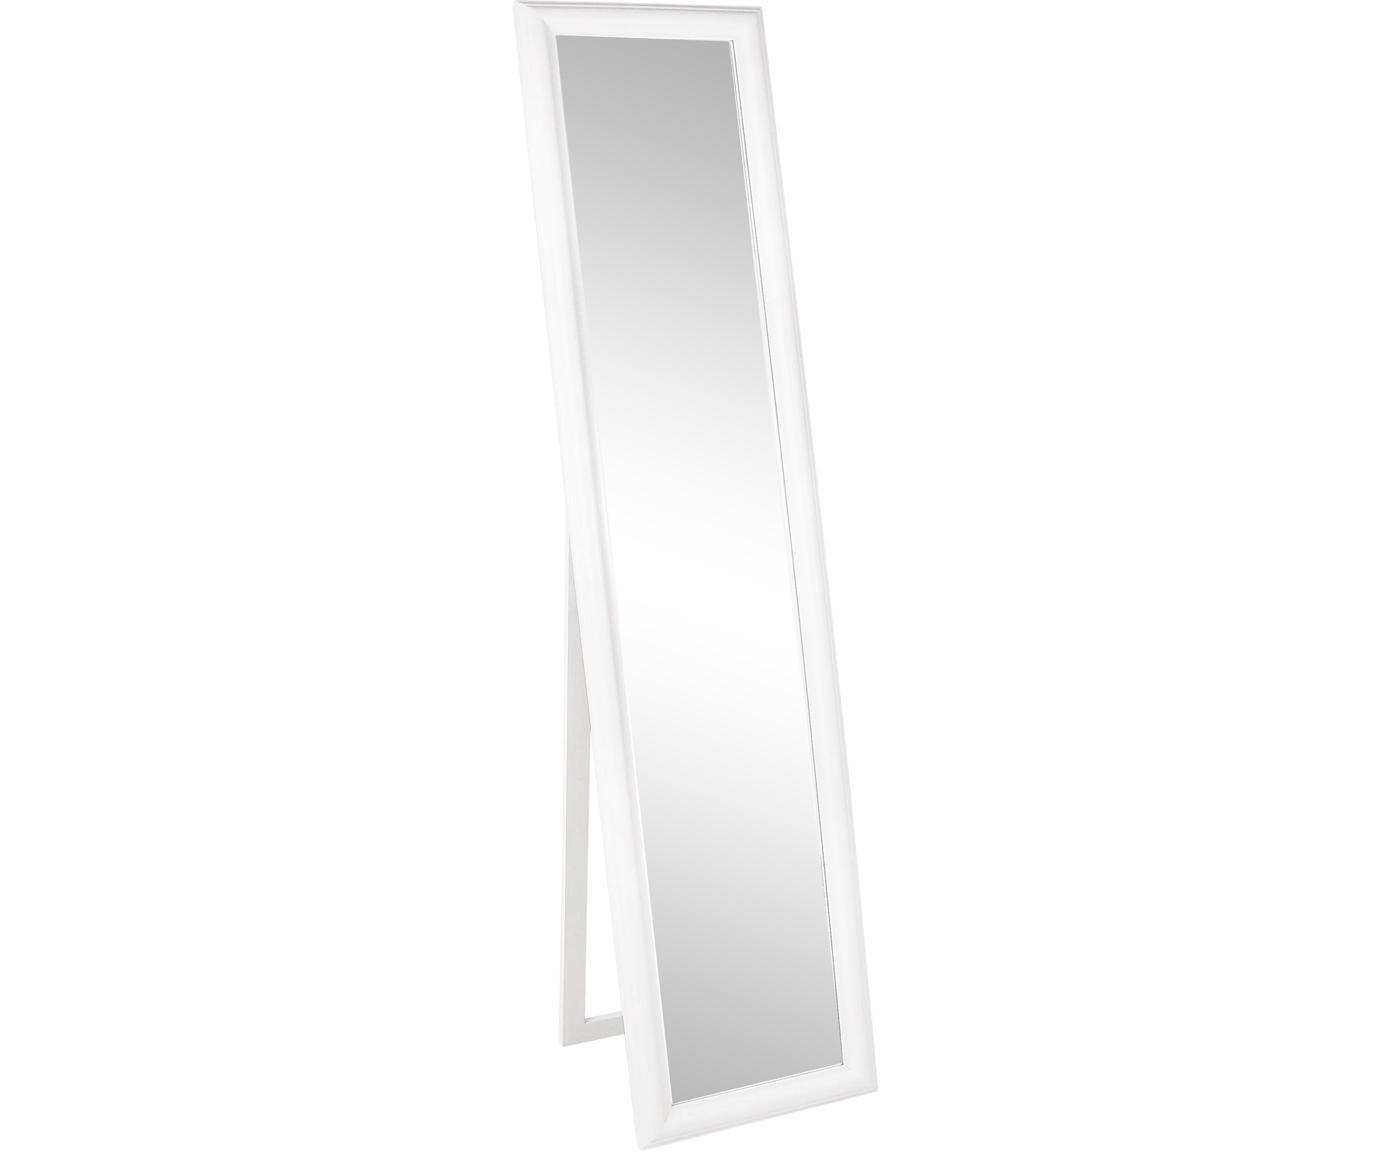 Vloerspiegel Sanzio, Lijst: gecoat hout, Wit, 40 x 170 cm